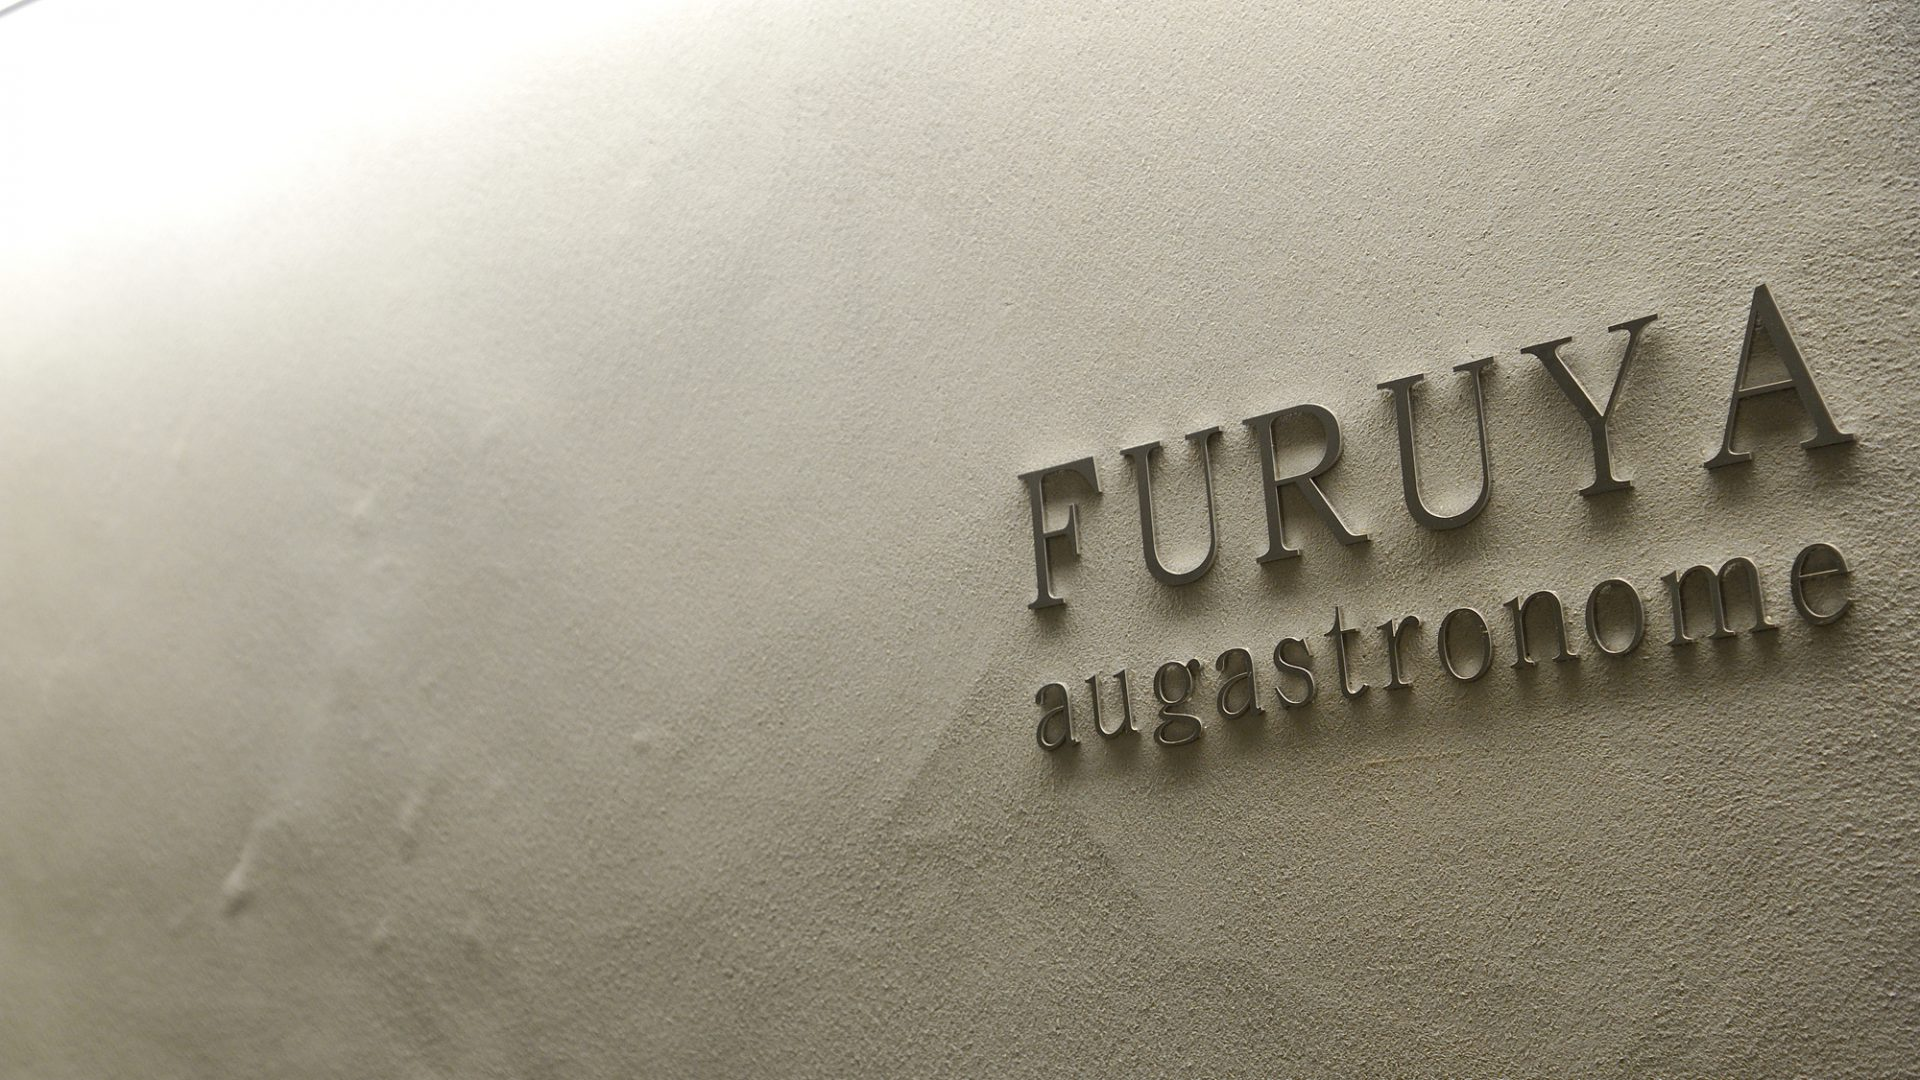 Restaurant  Furuya Augastronome レストラン古屋オーガストローム 赤坂